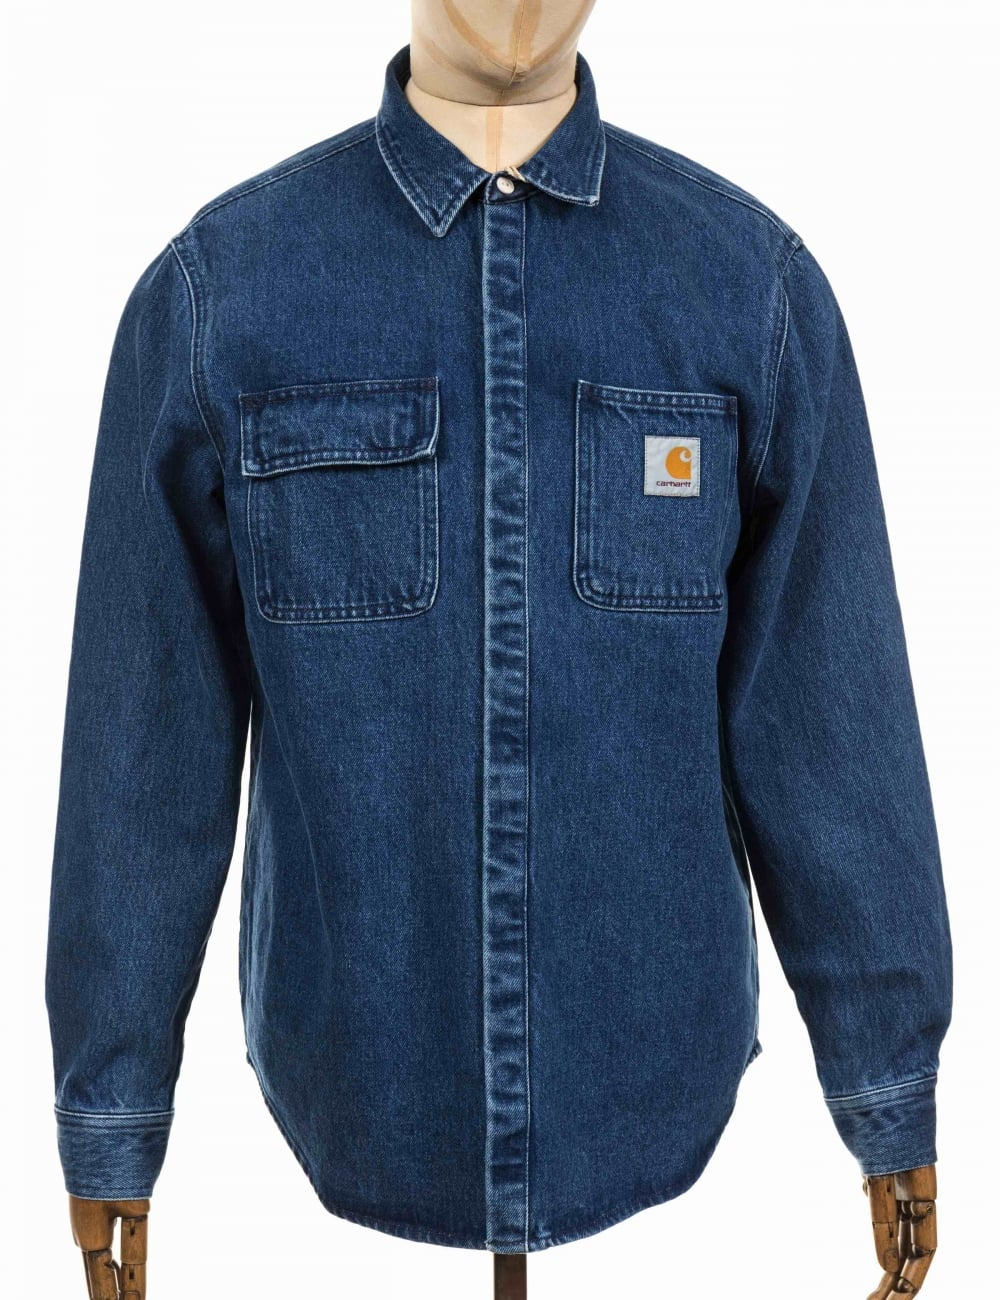 Carhartt WIP Salinac Shirt Jacket - Blue Stone Washed ...